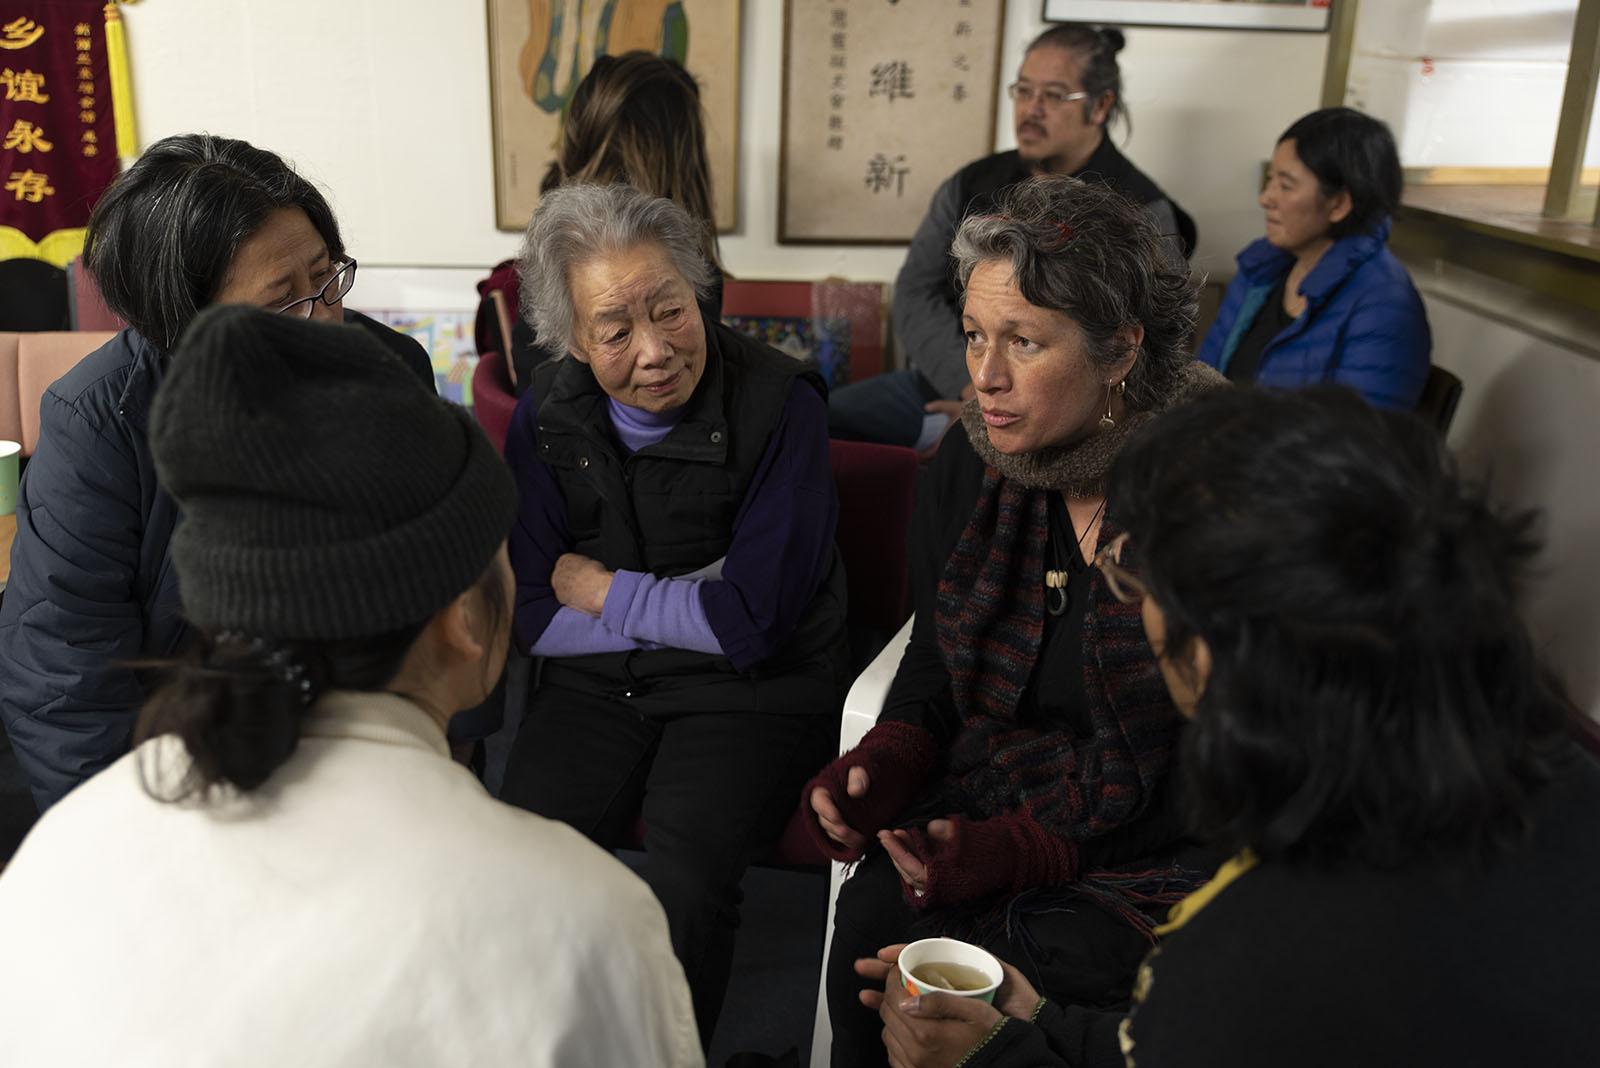 AAAH2018 Progressive Morning Tea, 22 September, Tung Jung Association Building. Photo by John Lake